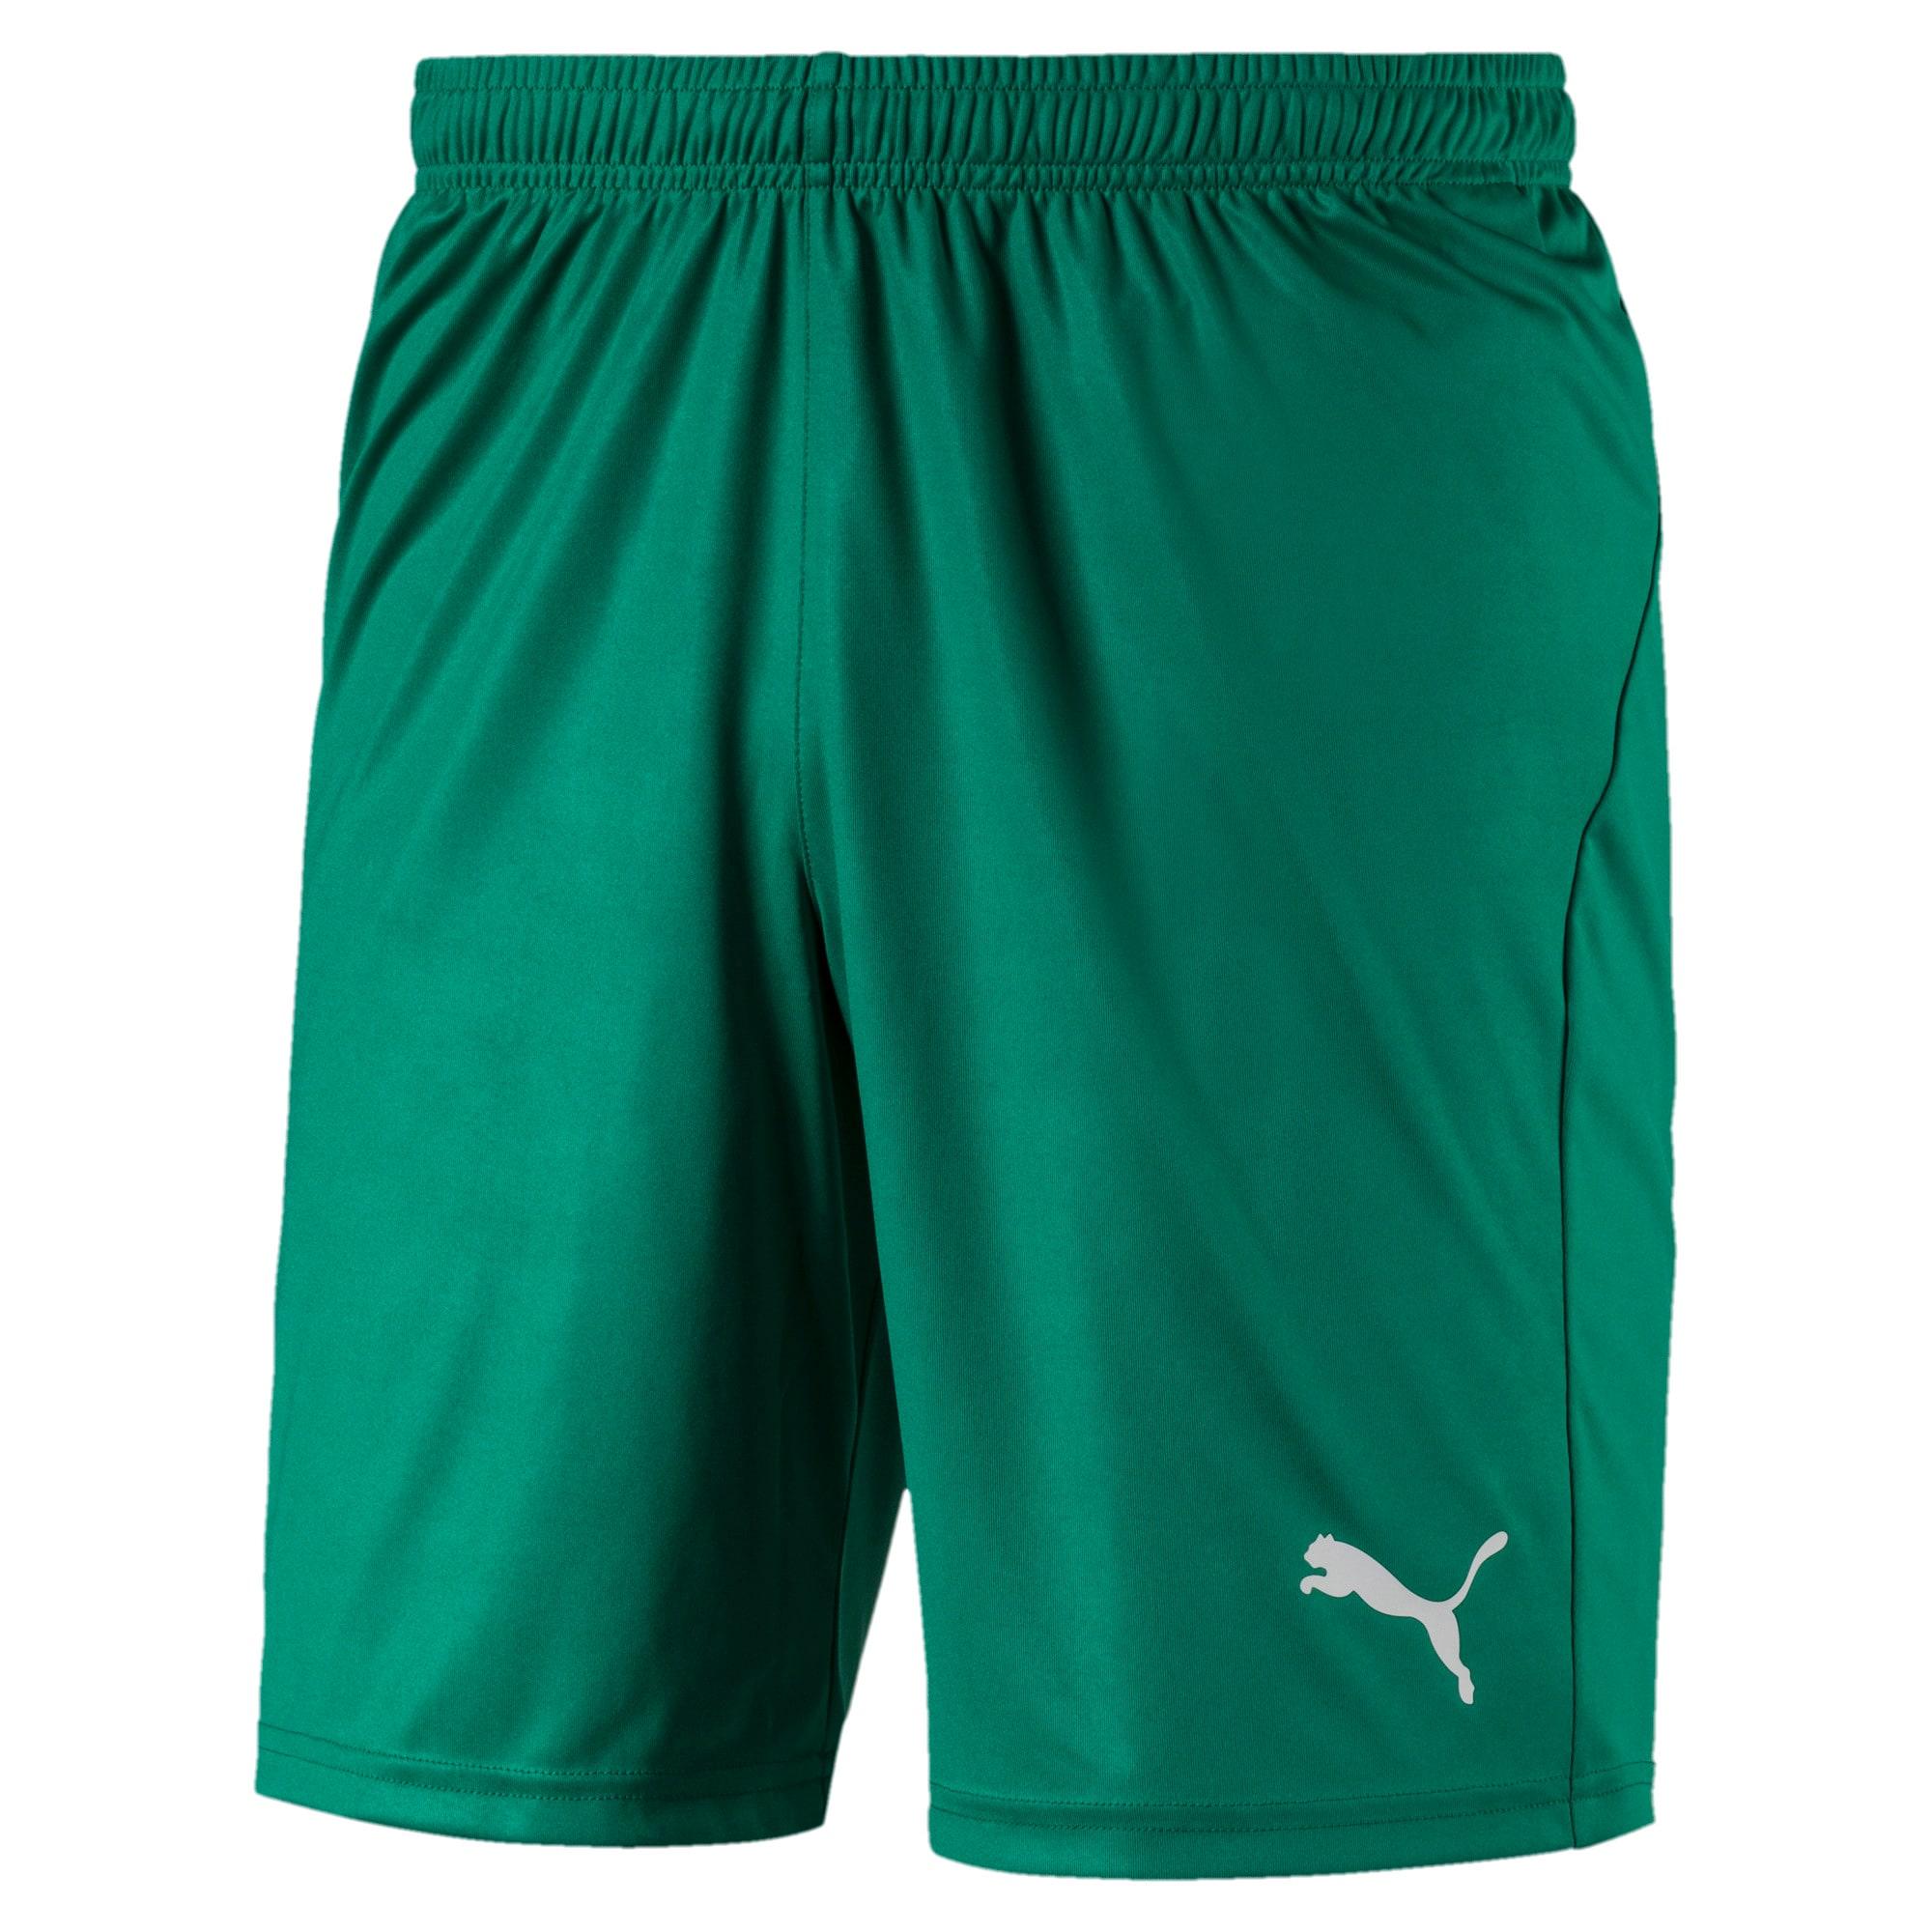 Thumbnail 1 of Liga Core Men's Shorts, Pepper Green-Puma White, medium